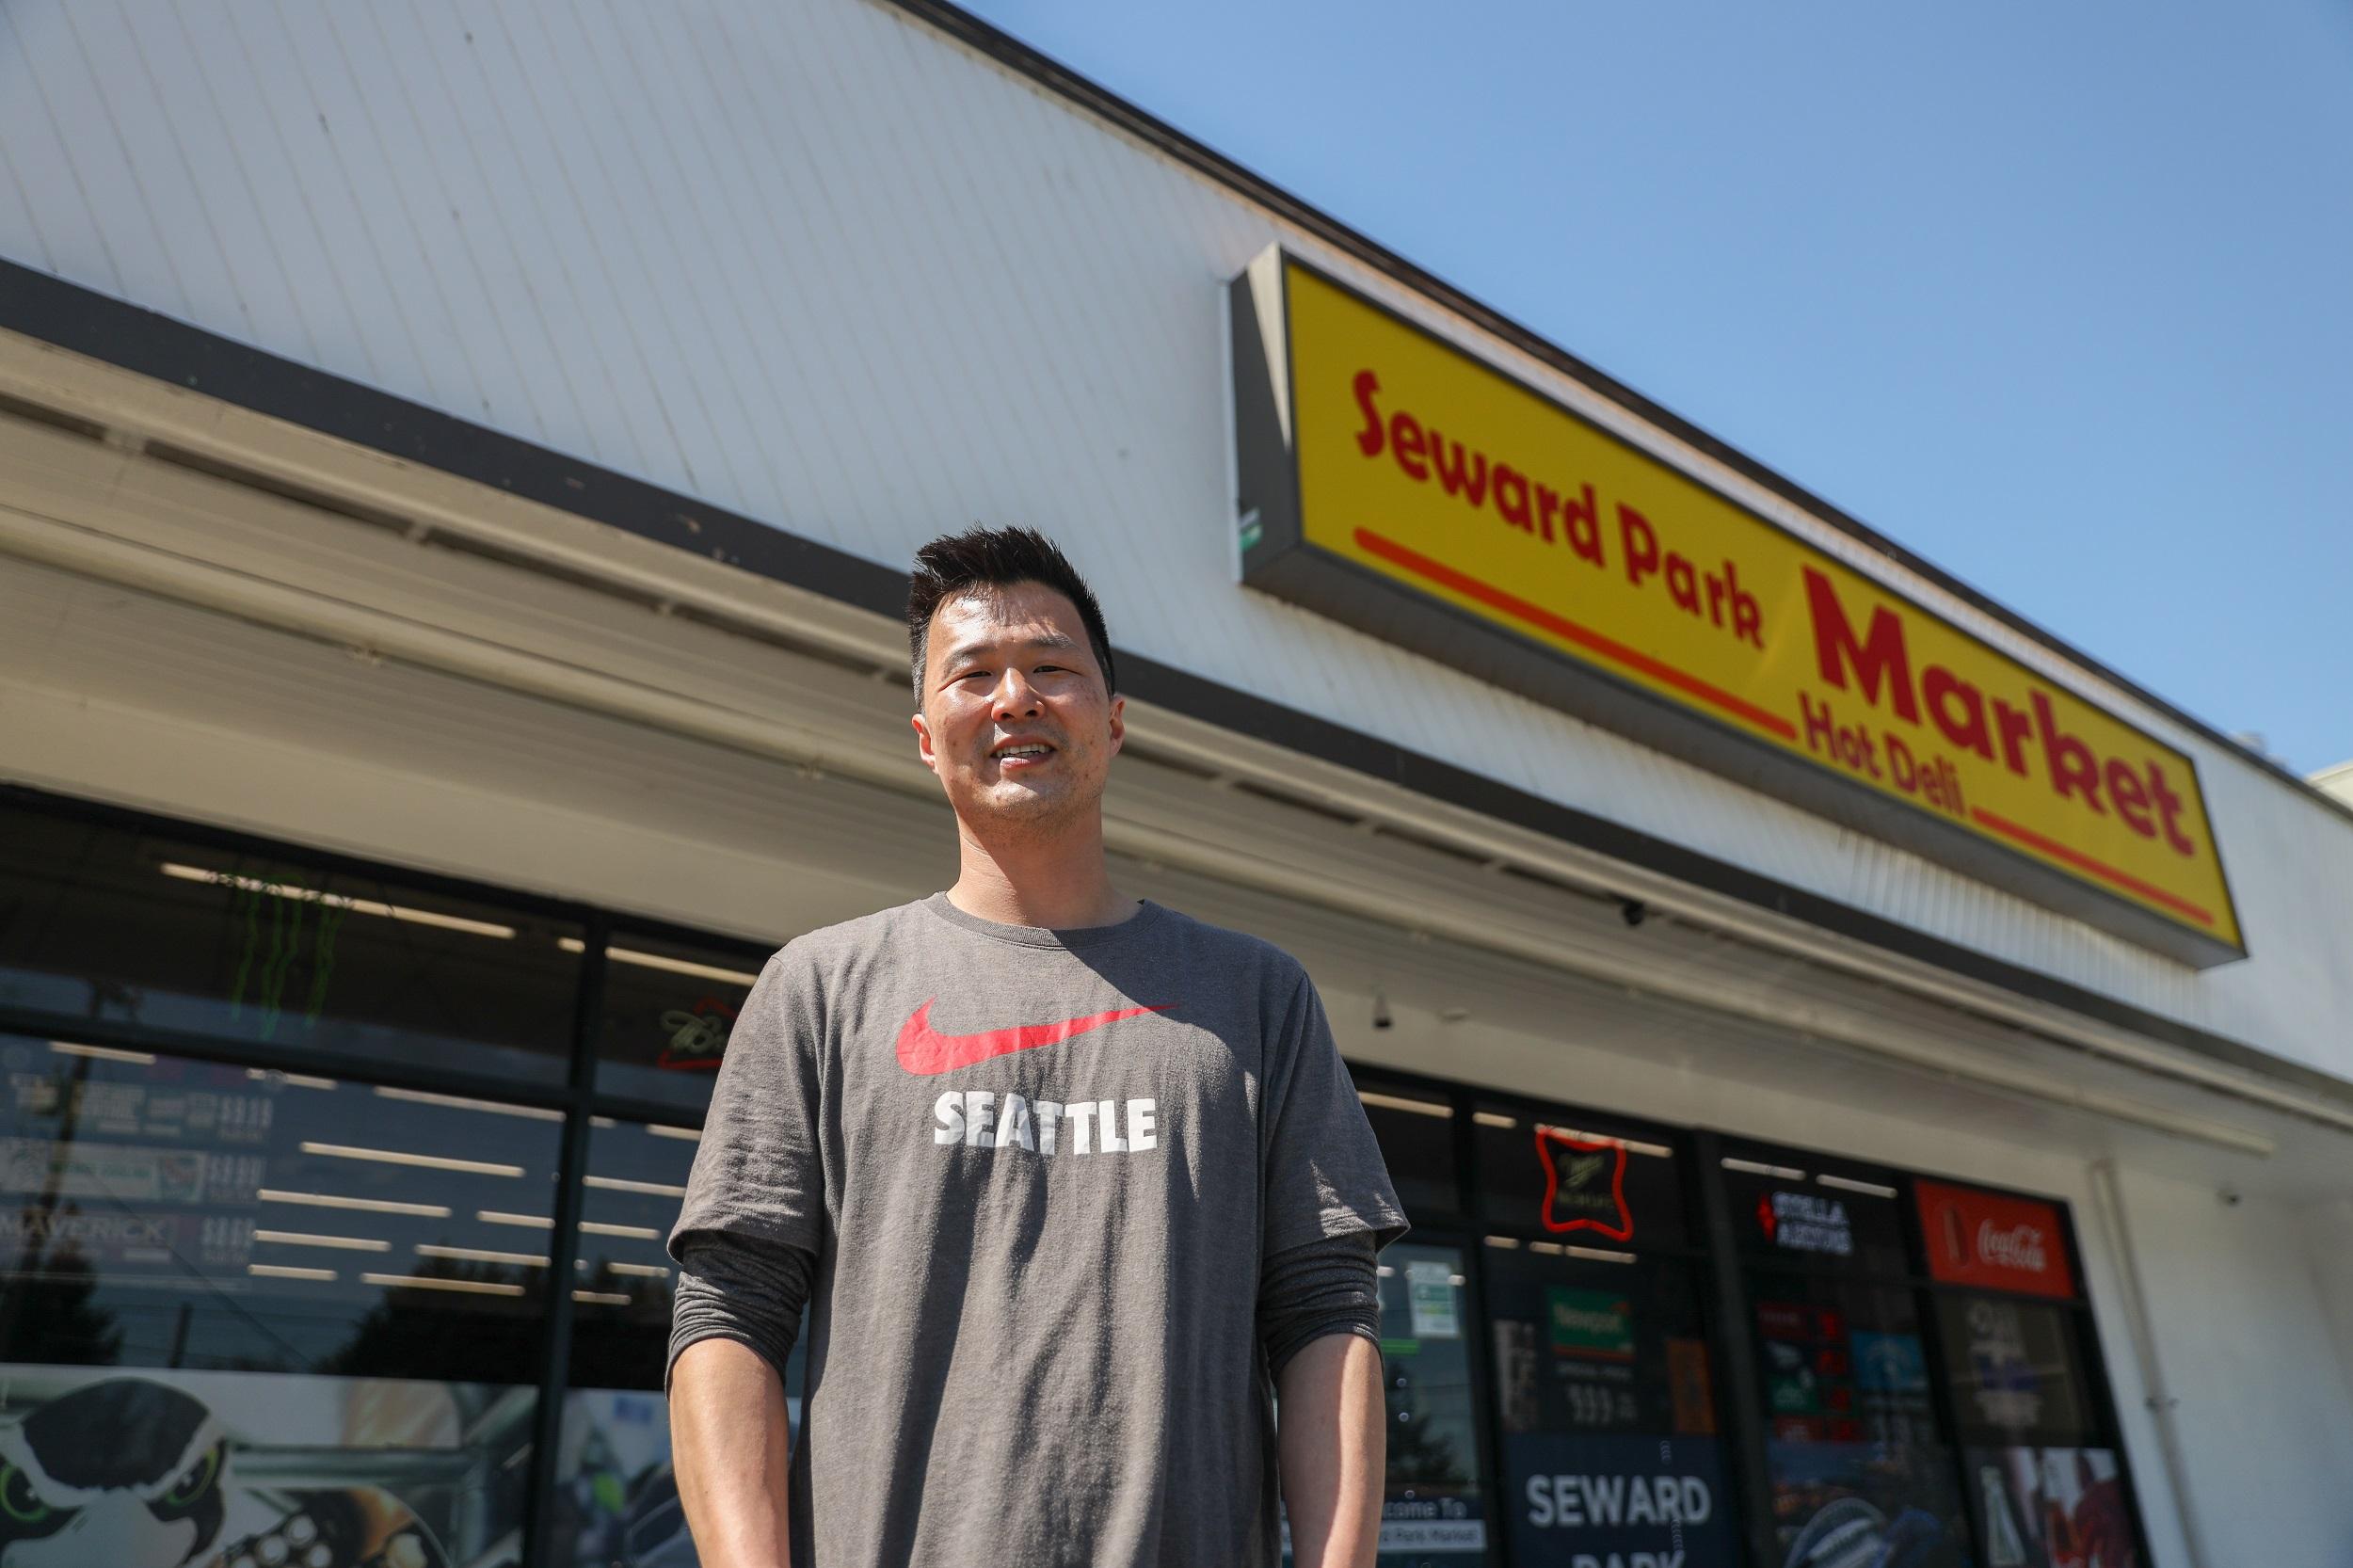 Richard wearing a Seattle t-shirt standing in front of Seward Park Market